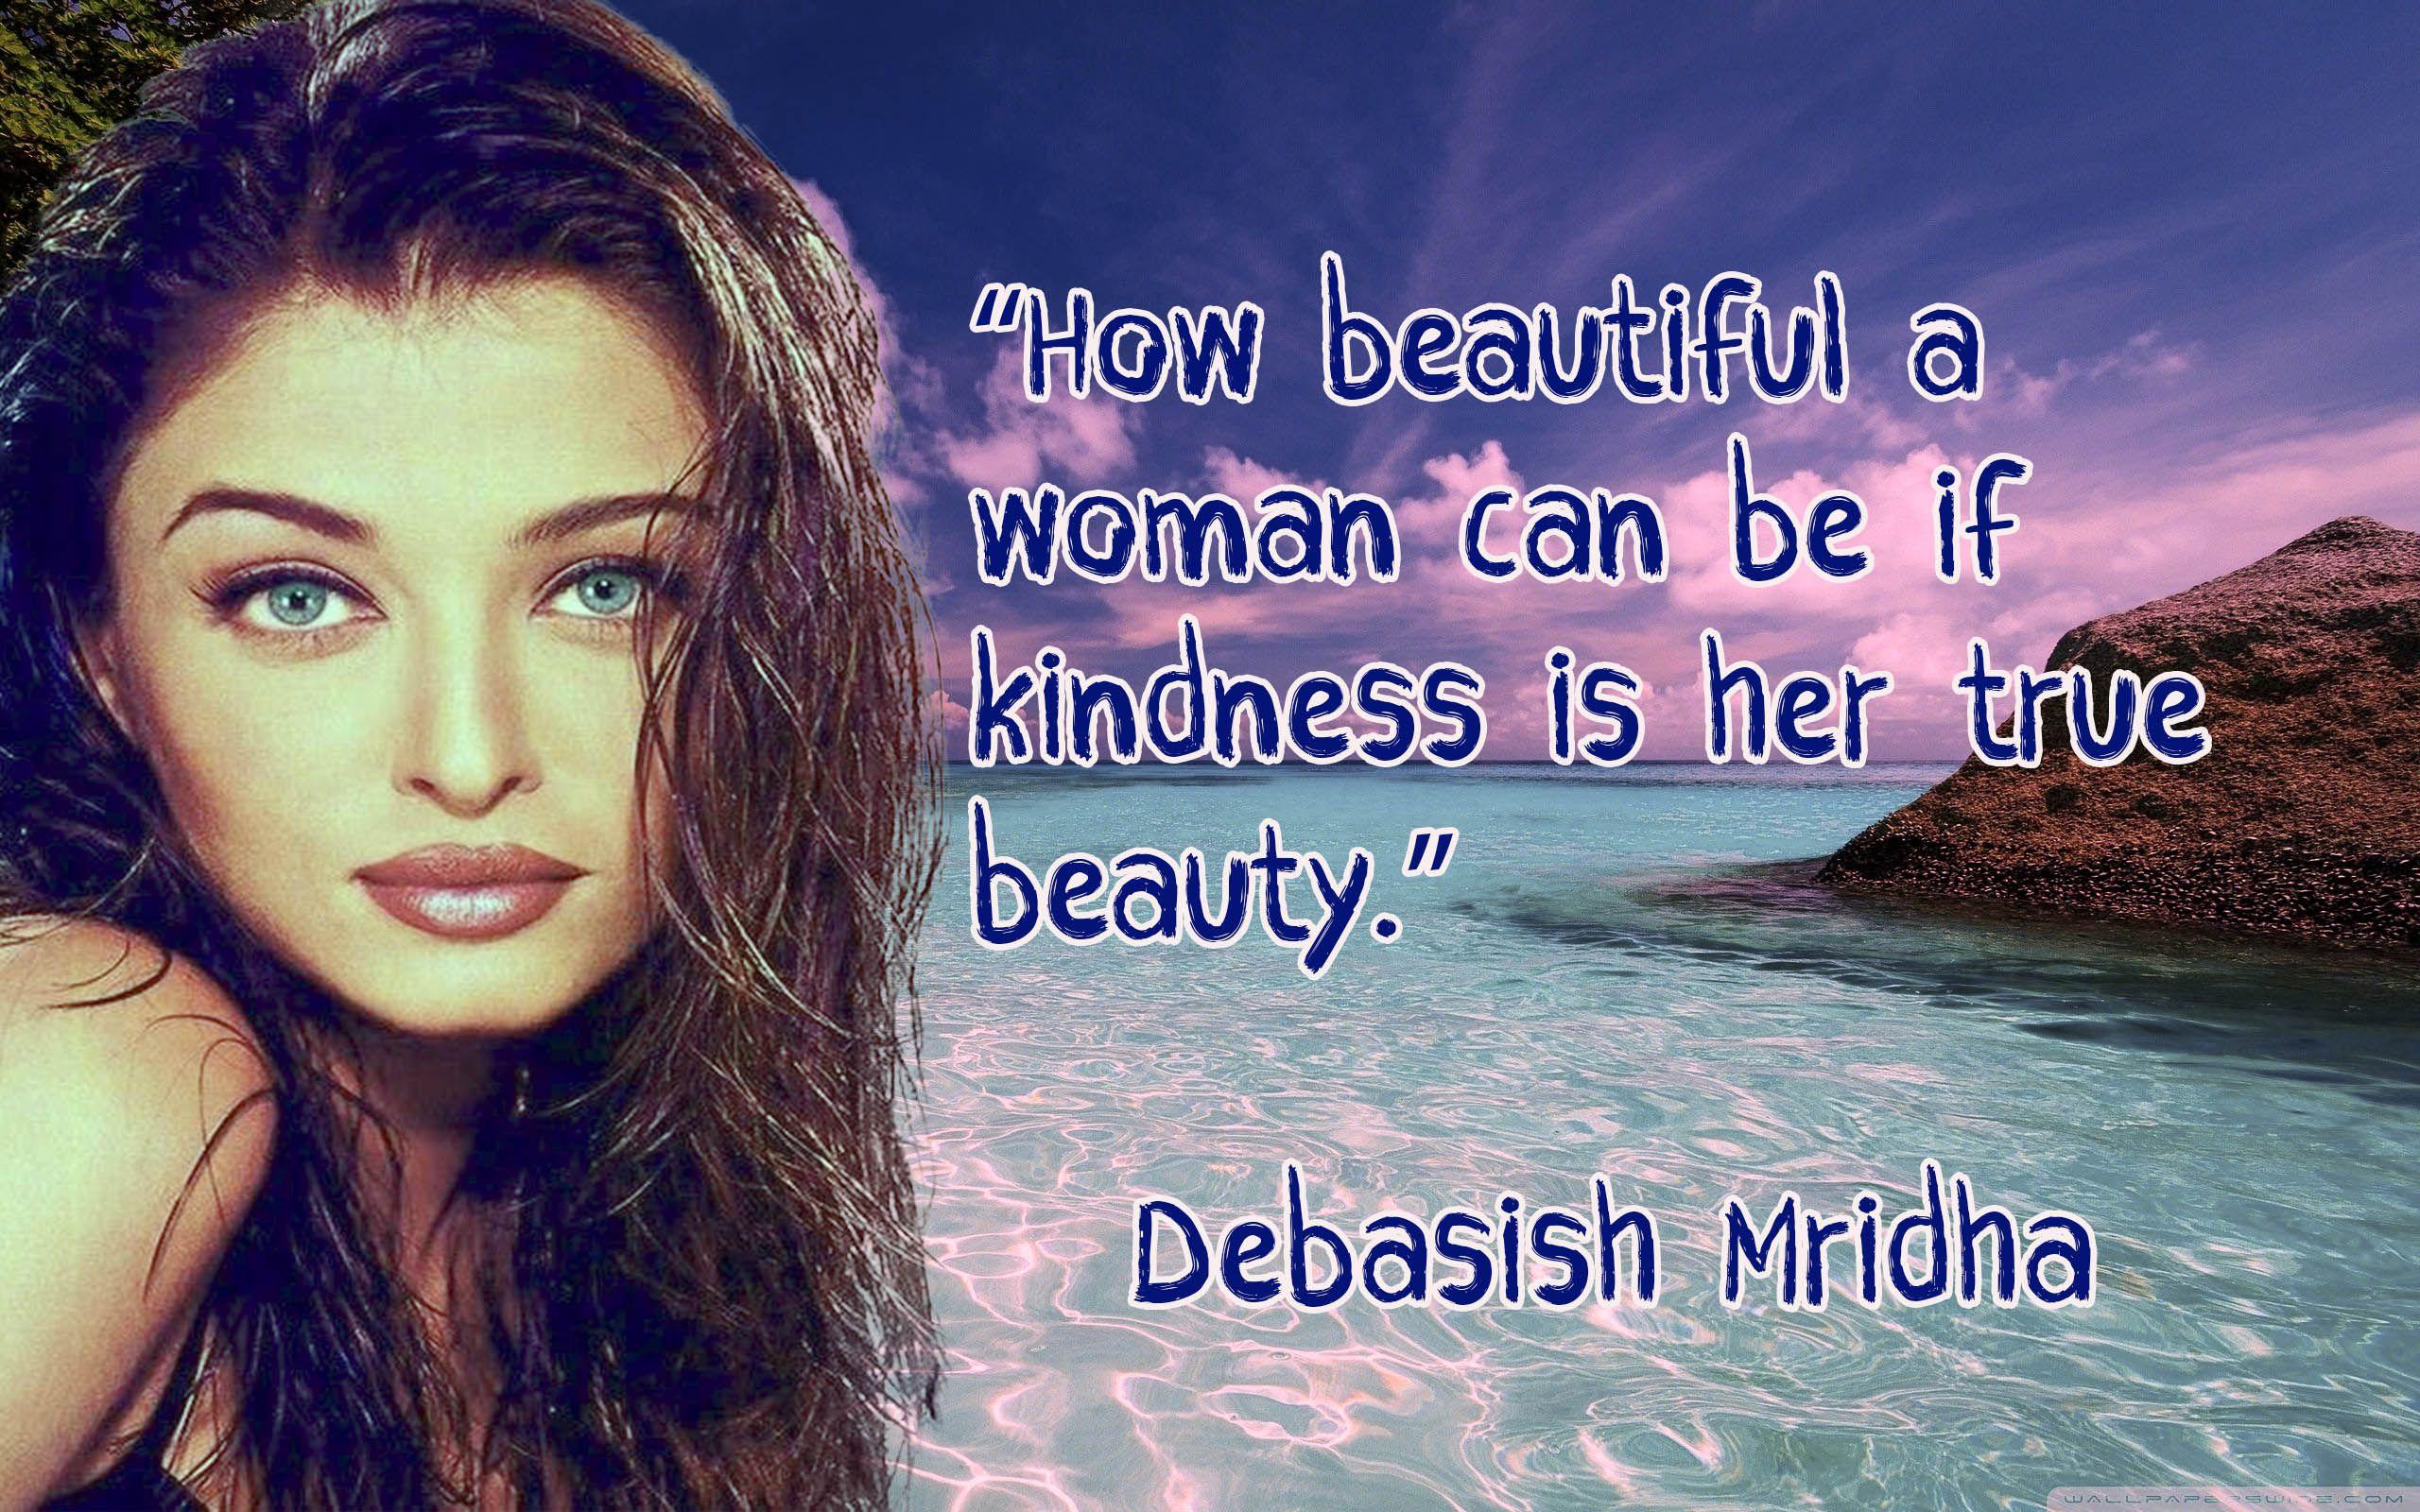 Aishwarya Rai Girl Quote Girl Quotes True Beauty How Beautiful